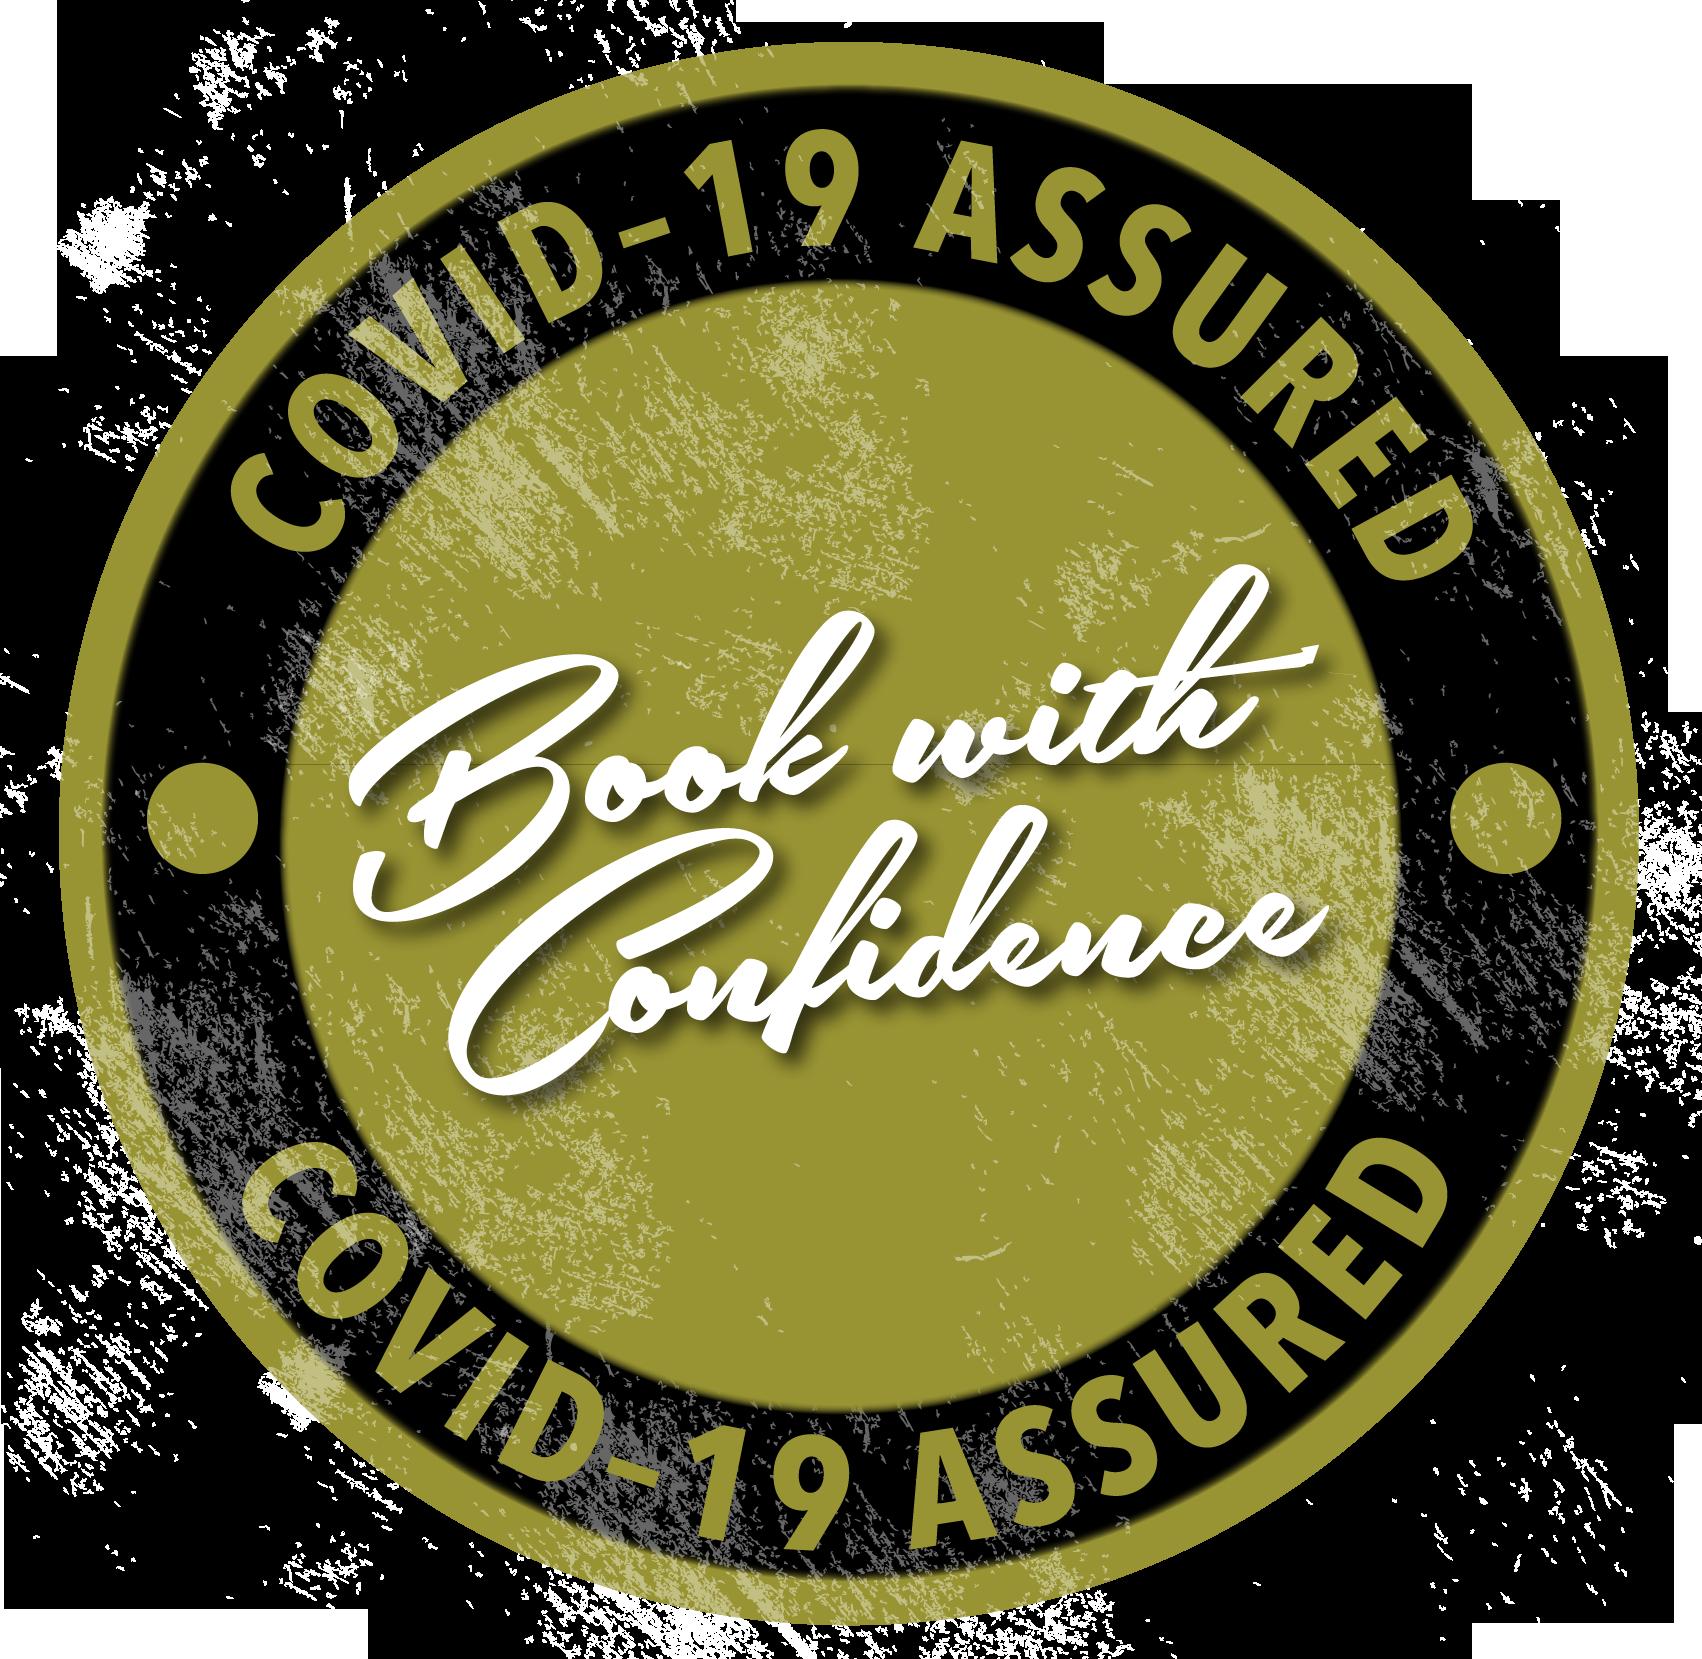 Covid Assurance